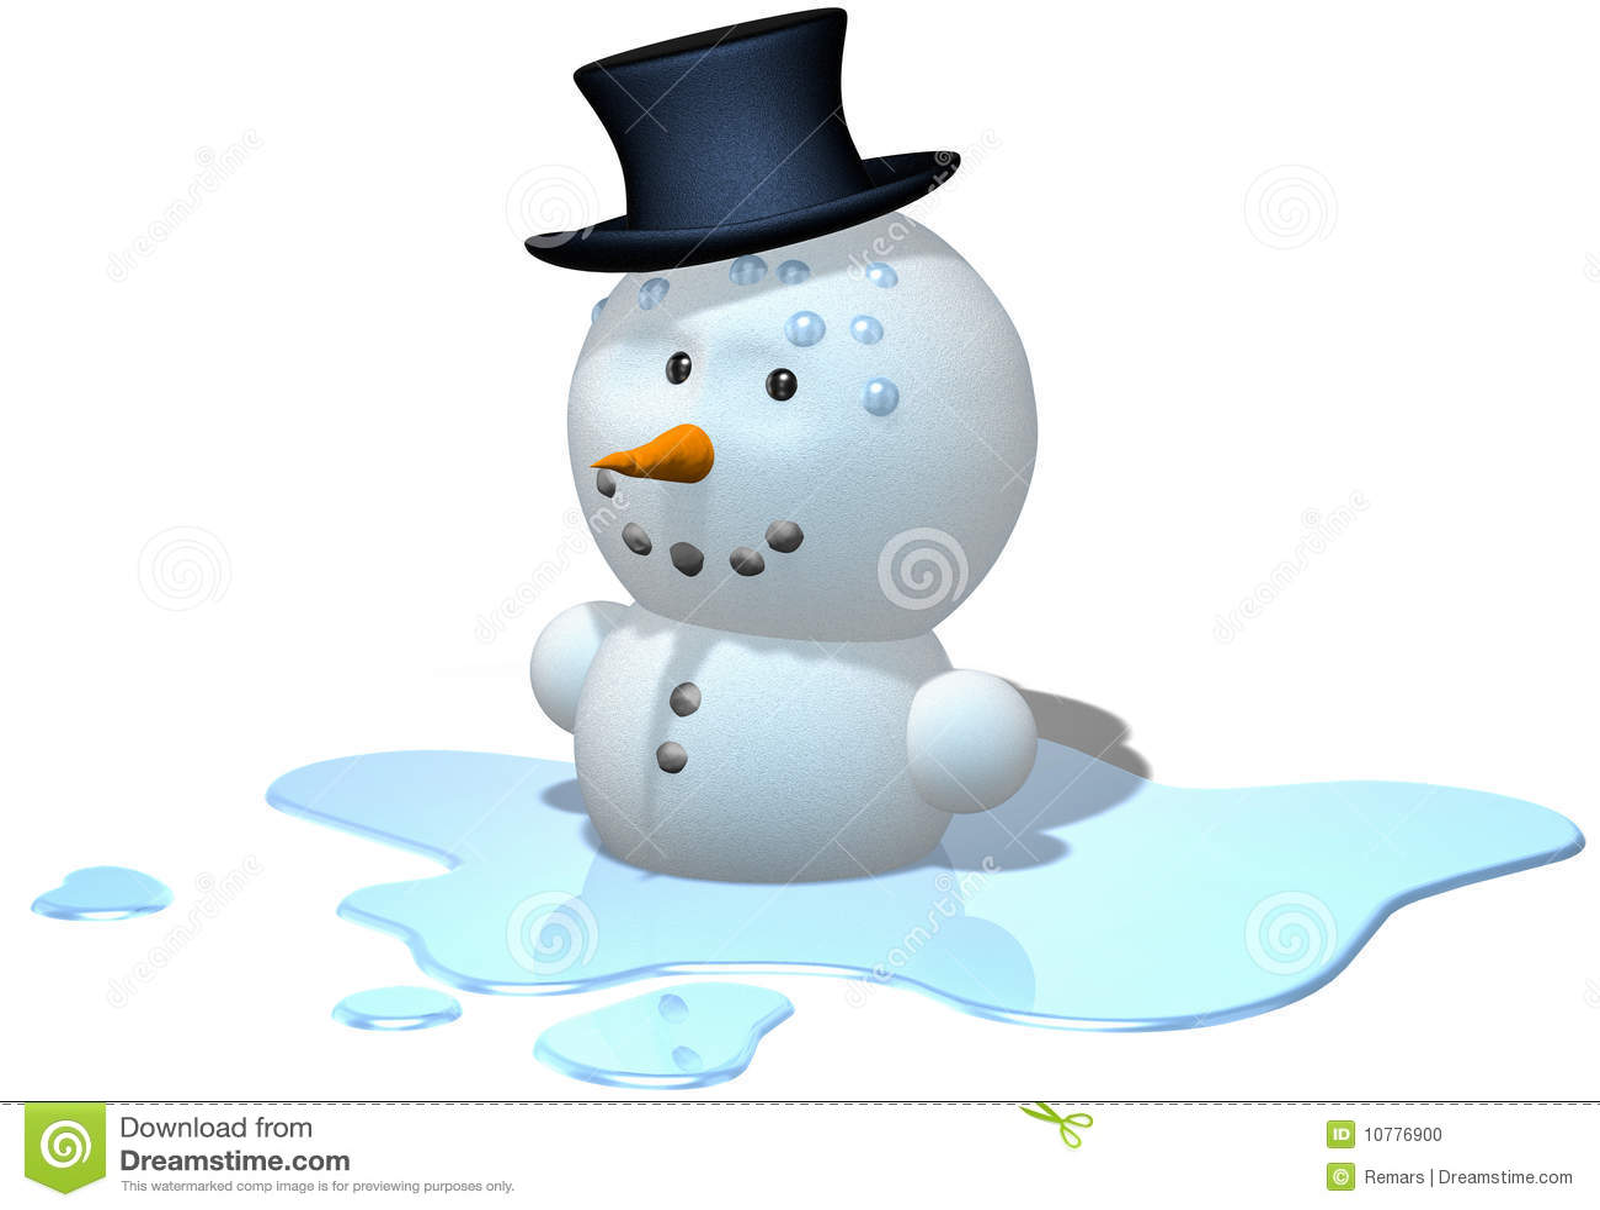 Melting Snowman Stock Photo - Image: 10776900